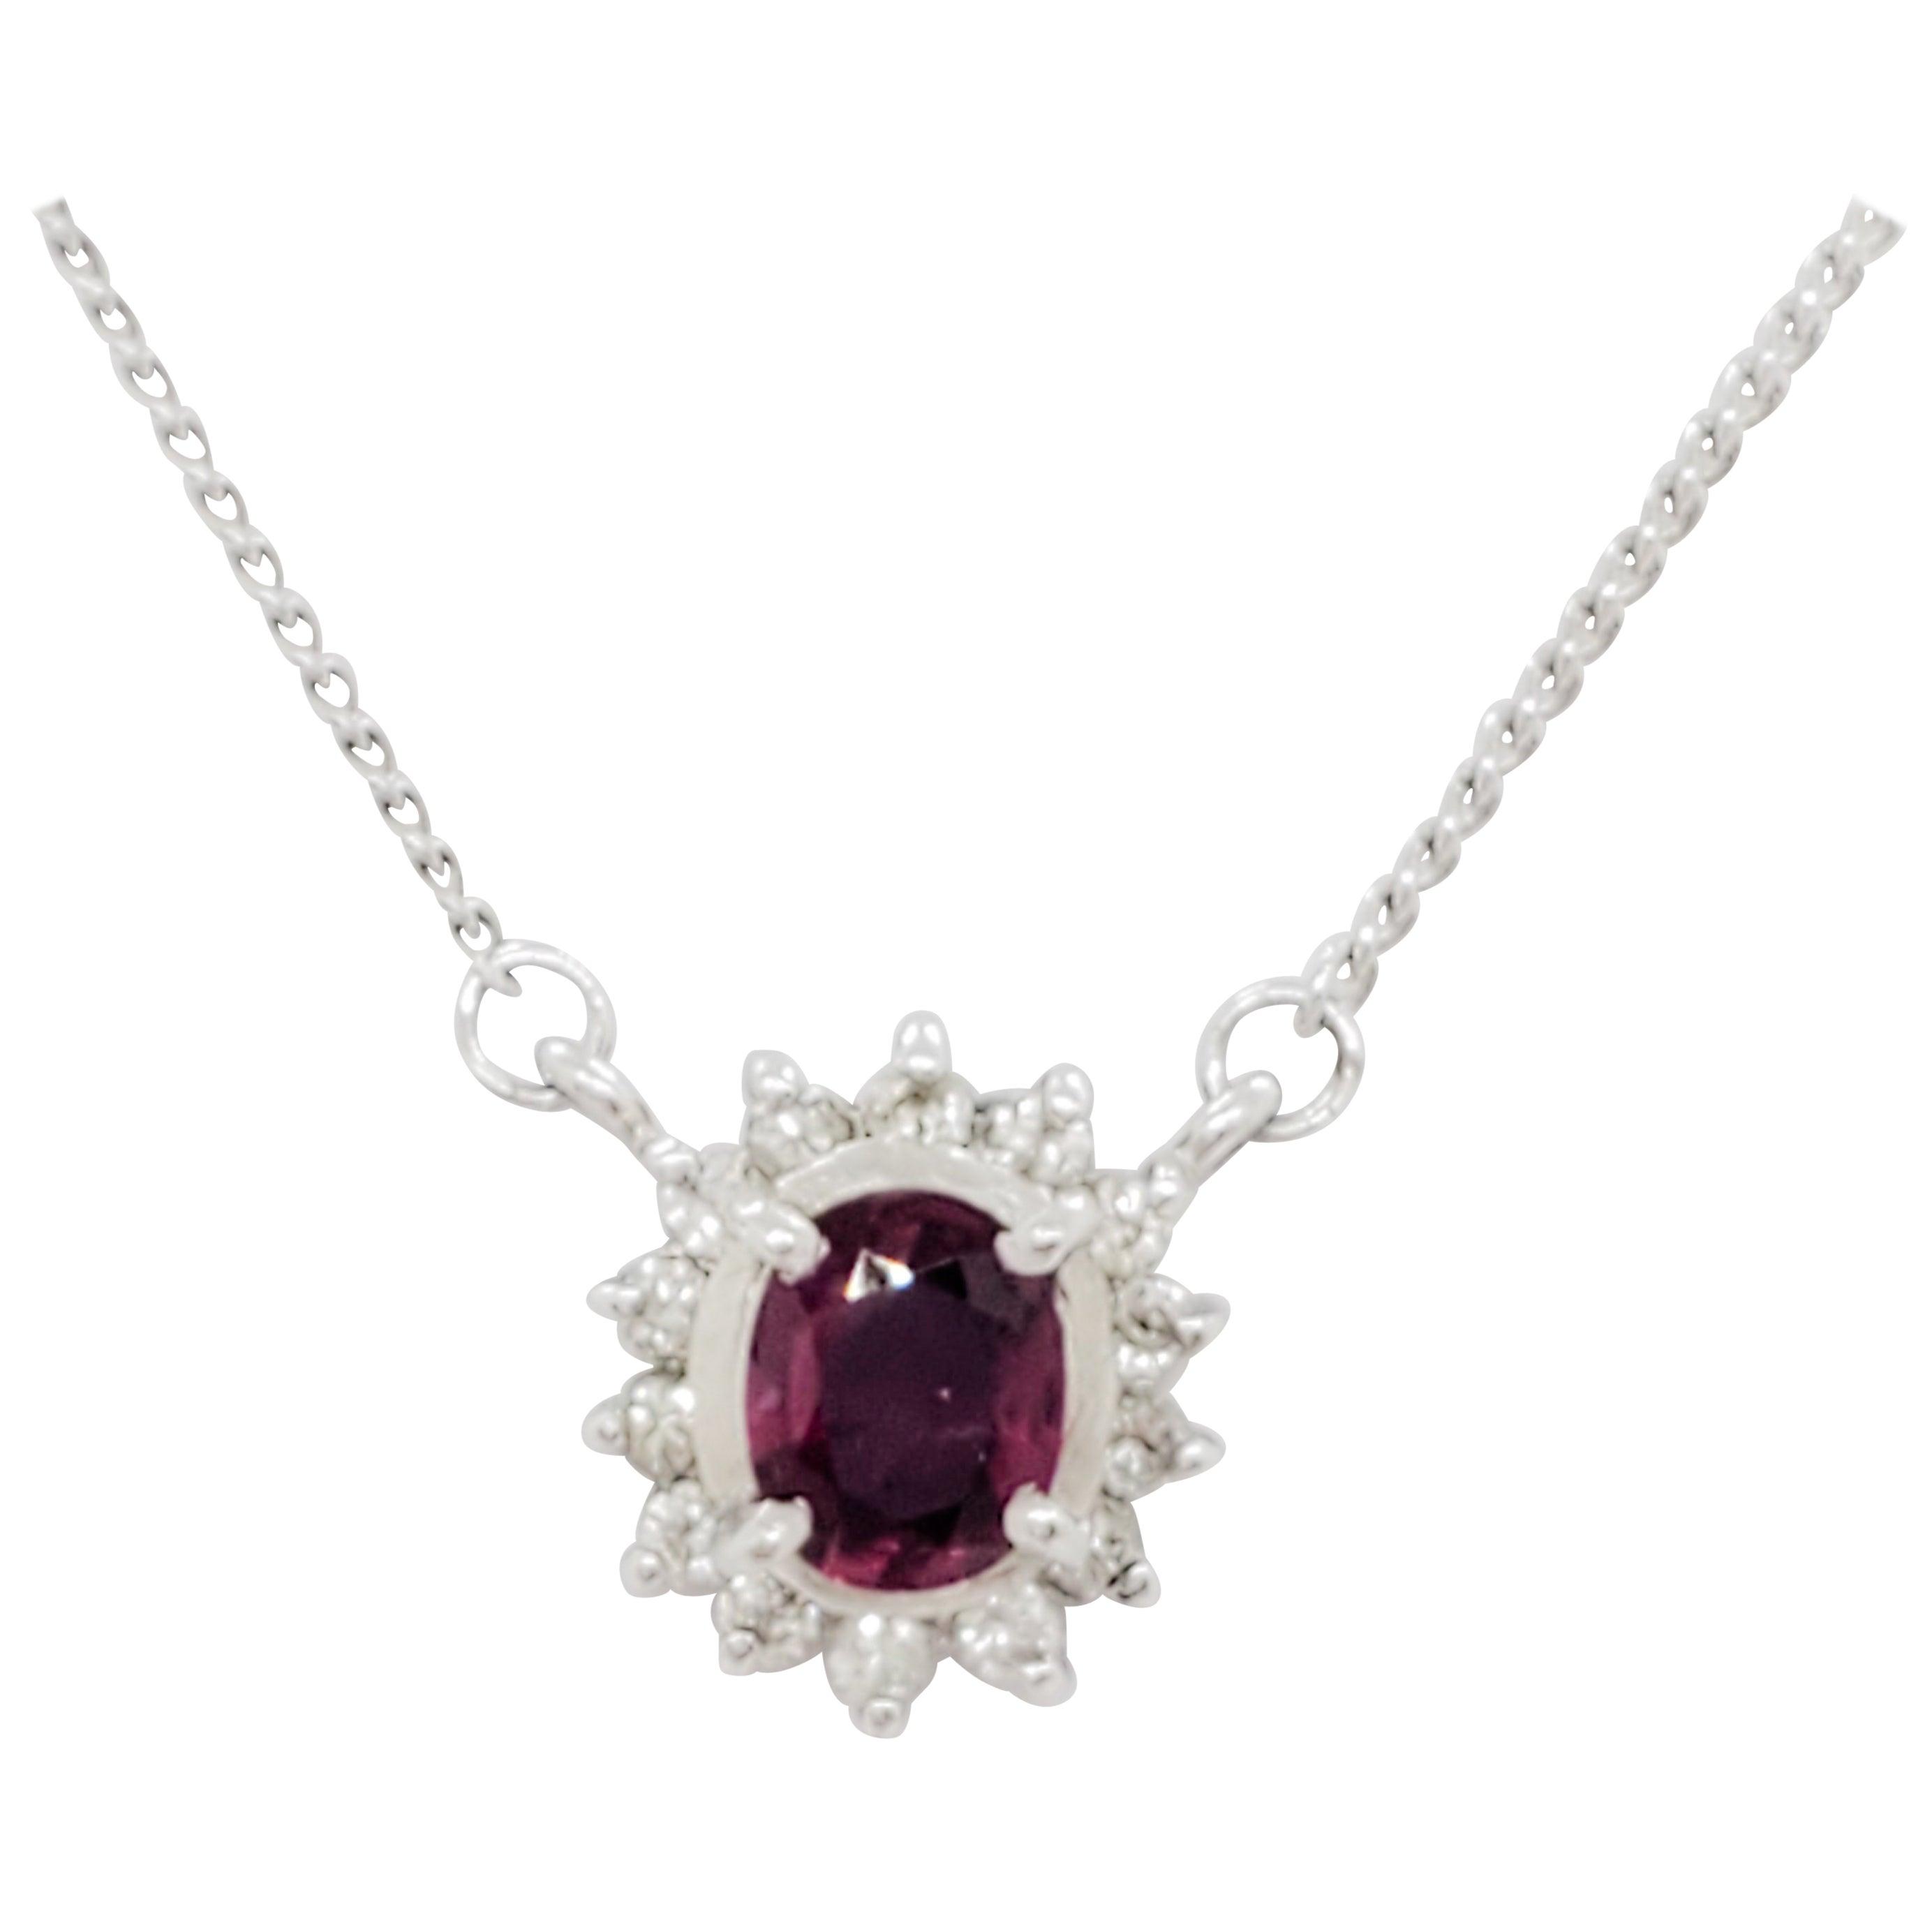 Estate Ruby and White Diamond Pendant Necklace in Platinum